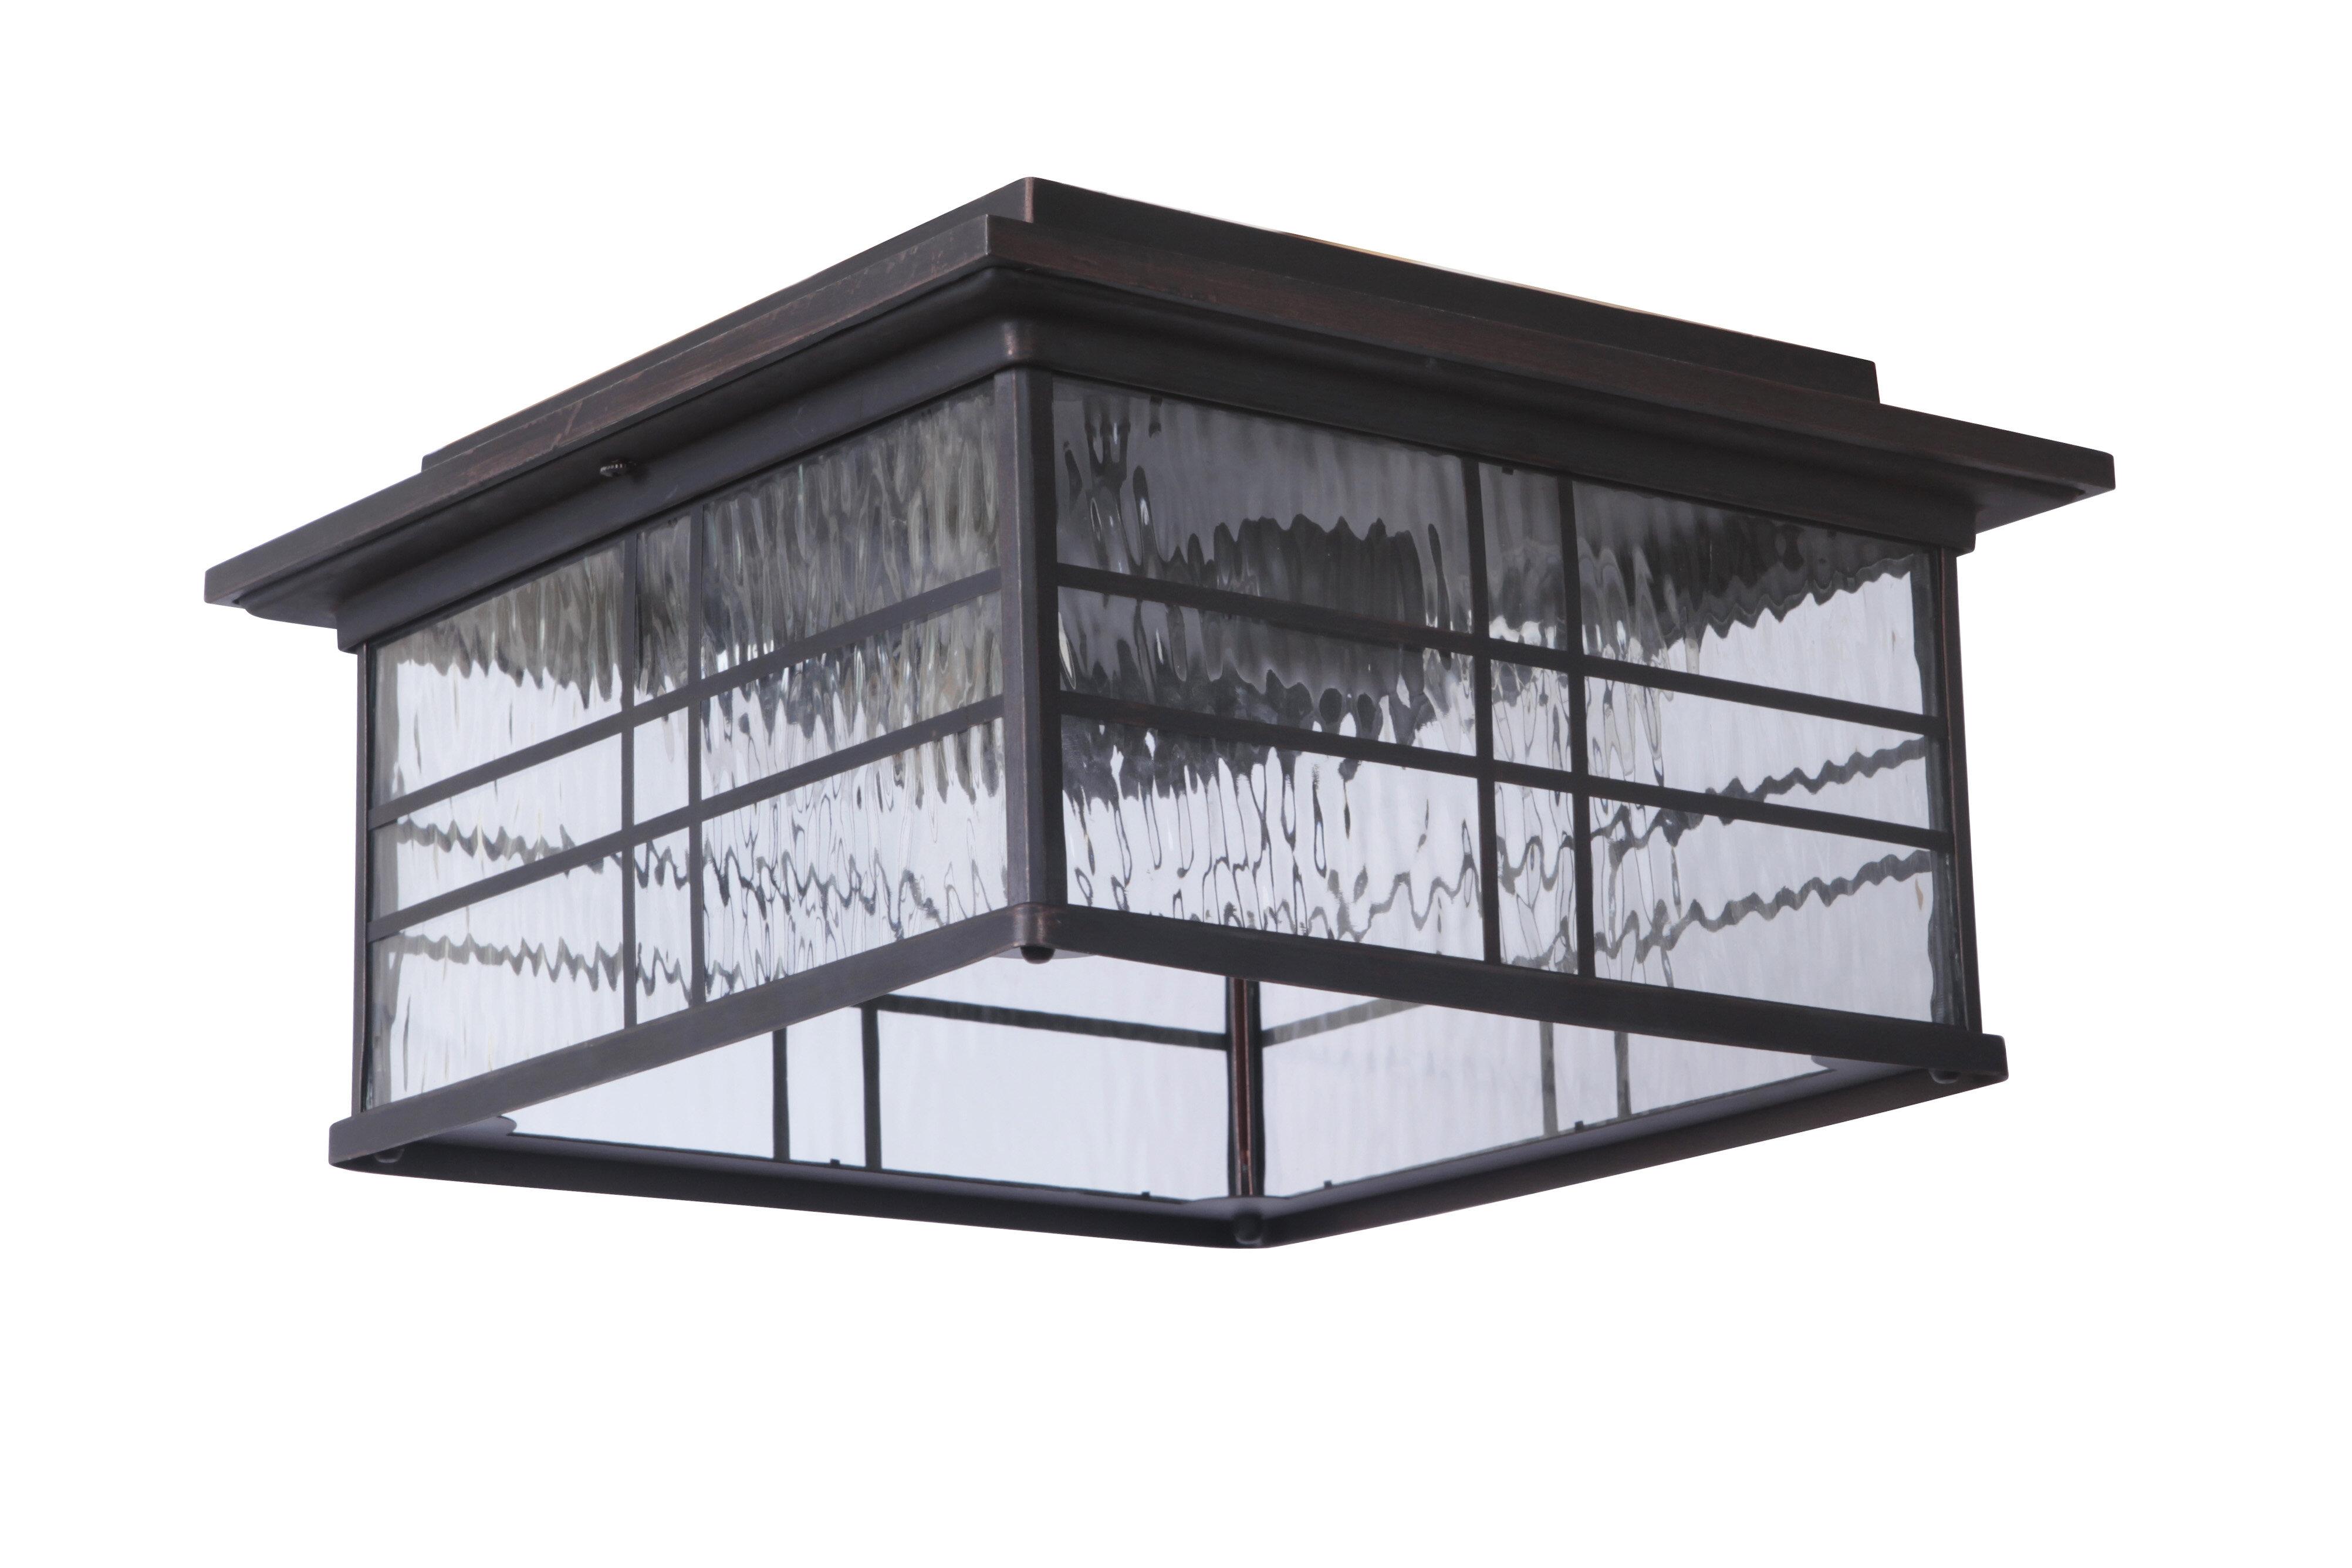 Darby Home Co Sanderson 2 Light Outdoor Flush Mount Reviews Wayfair